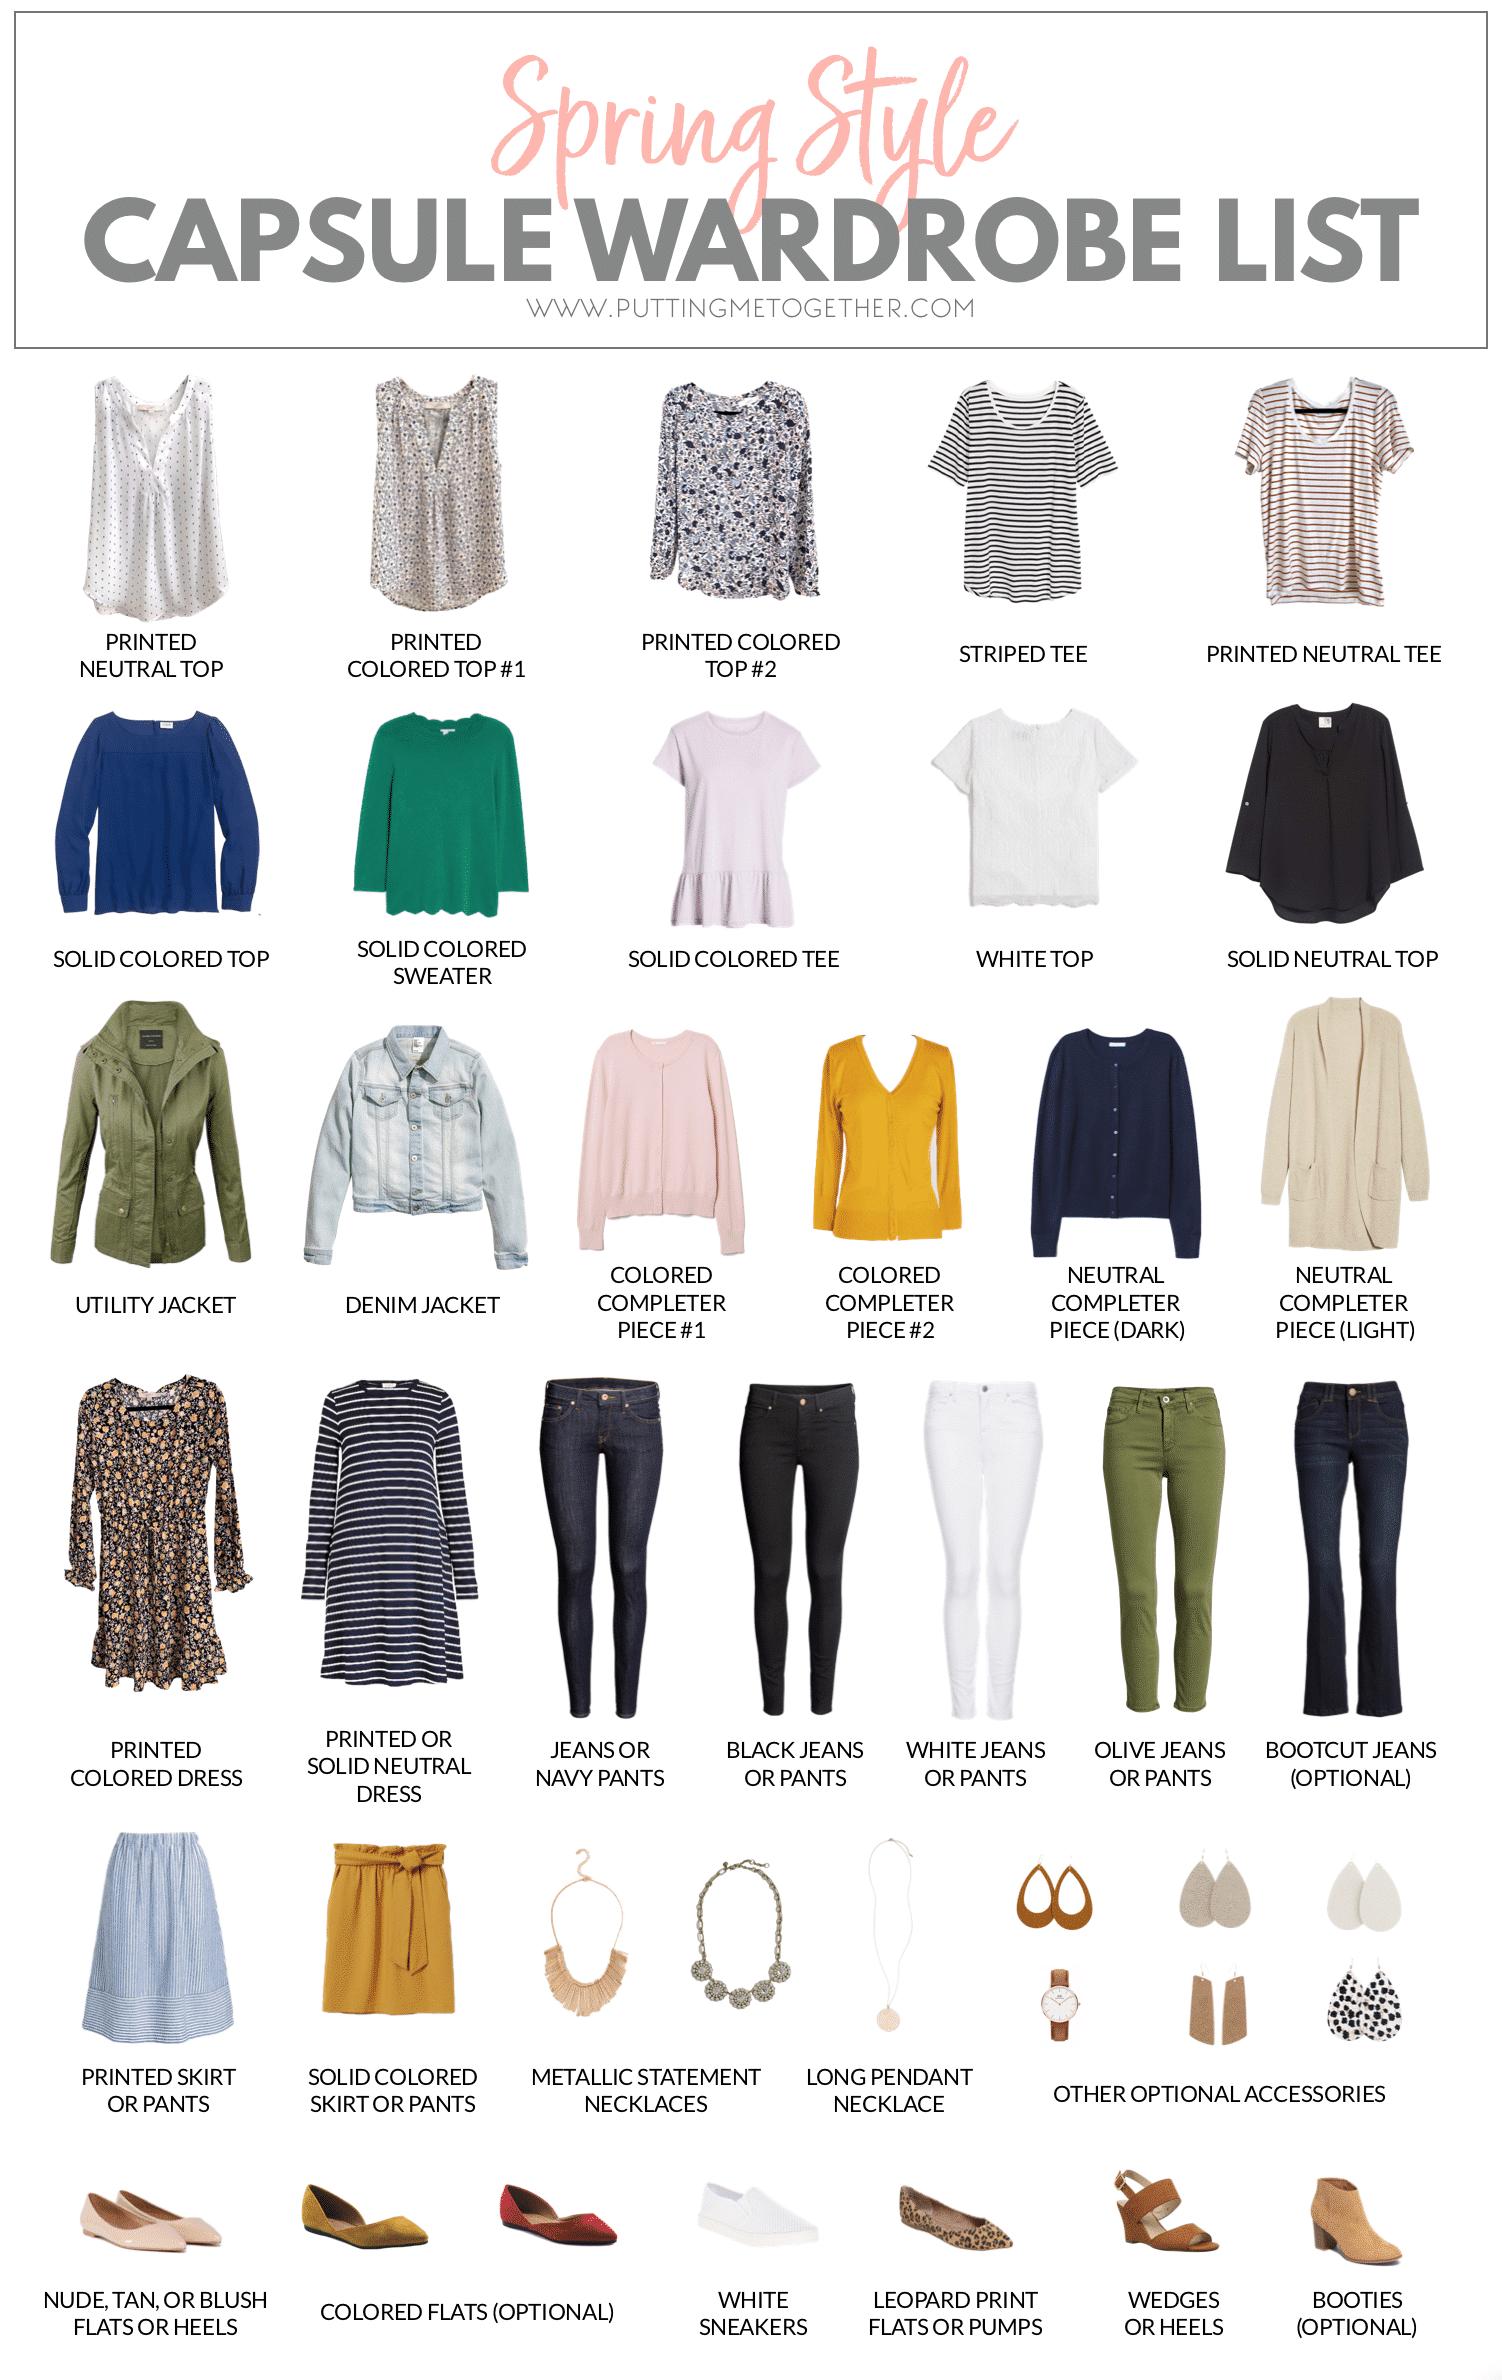 Capsule Wardrobe 2020 Fall.Spring Capsule Wardrobe For 2019 15 Off Nickel Suede